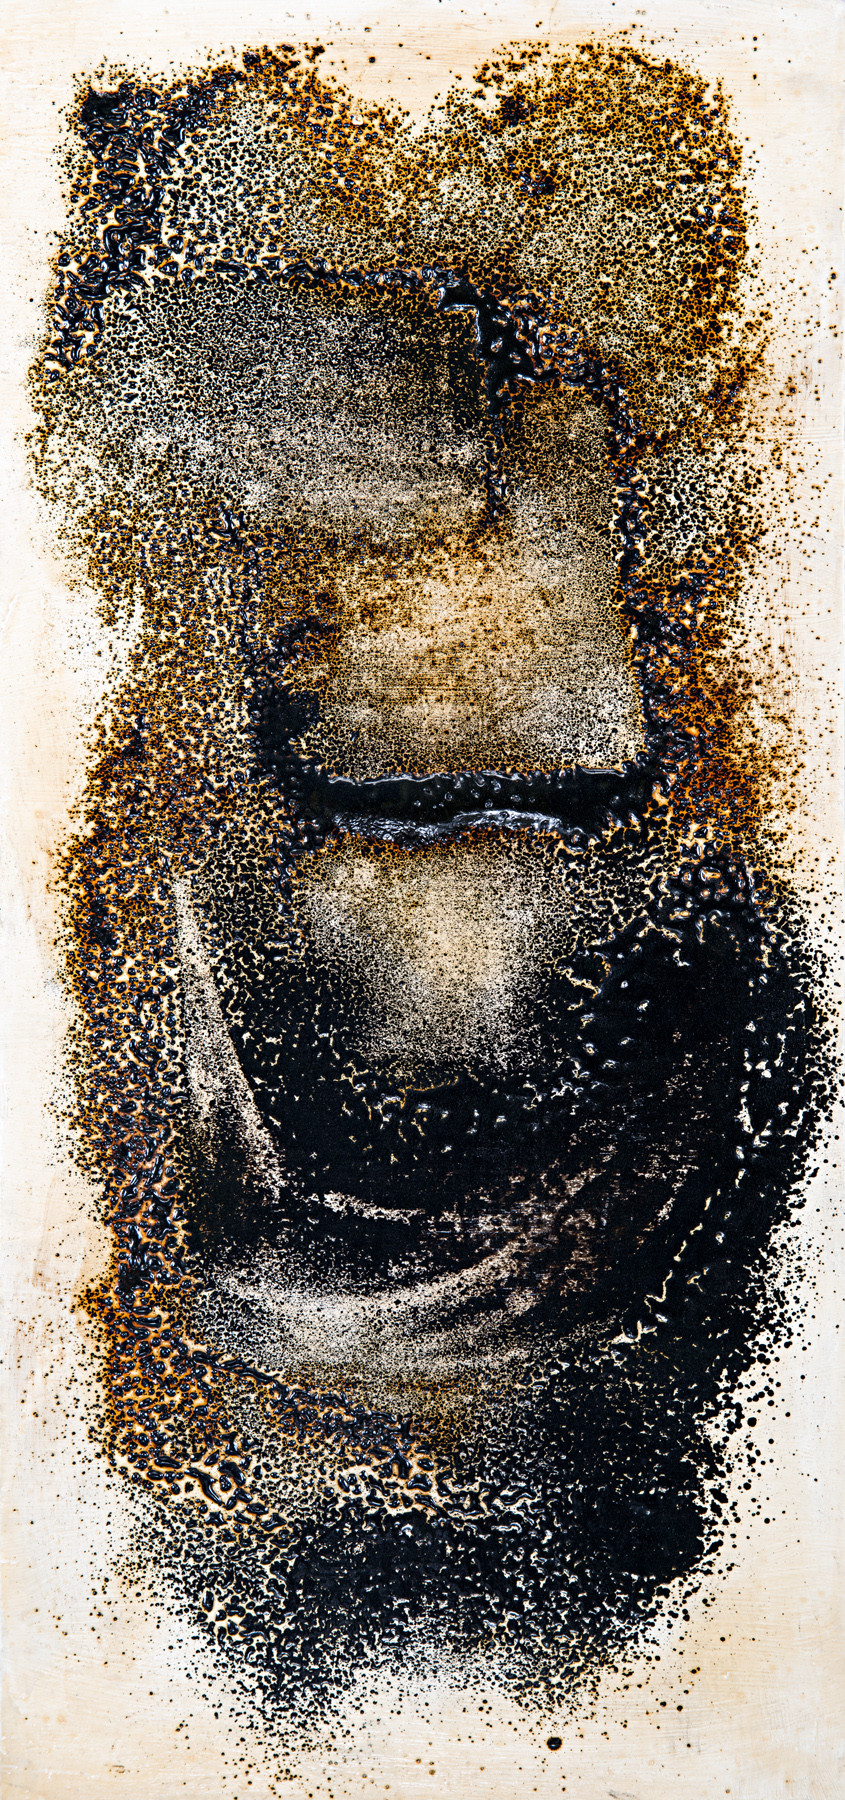 Winter Chill by Simran KS Lamba, Abstract Painting, Mixed Media on Wood, Brown color